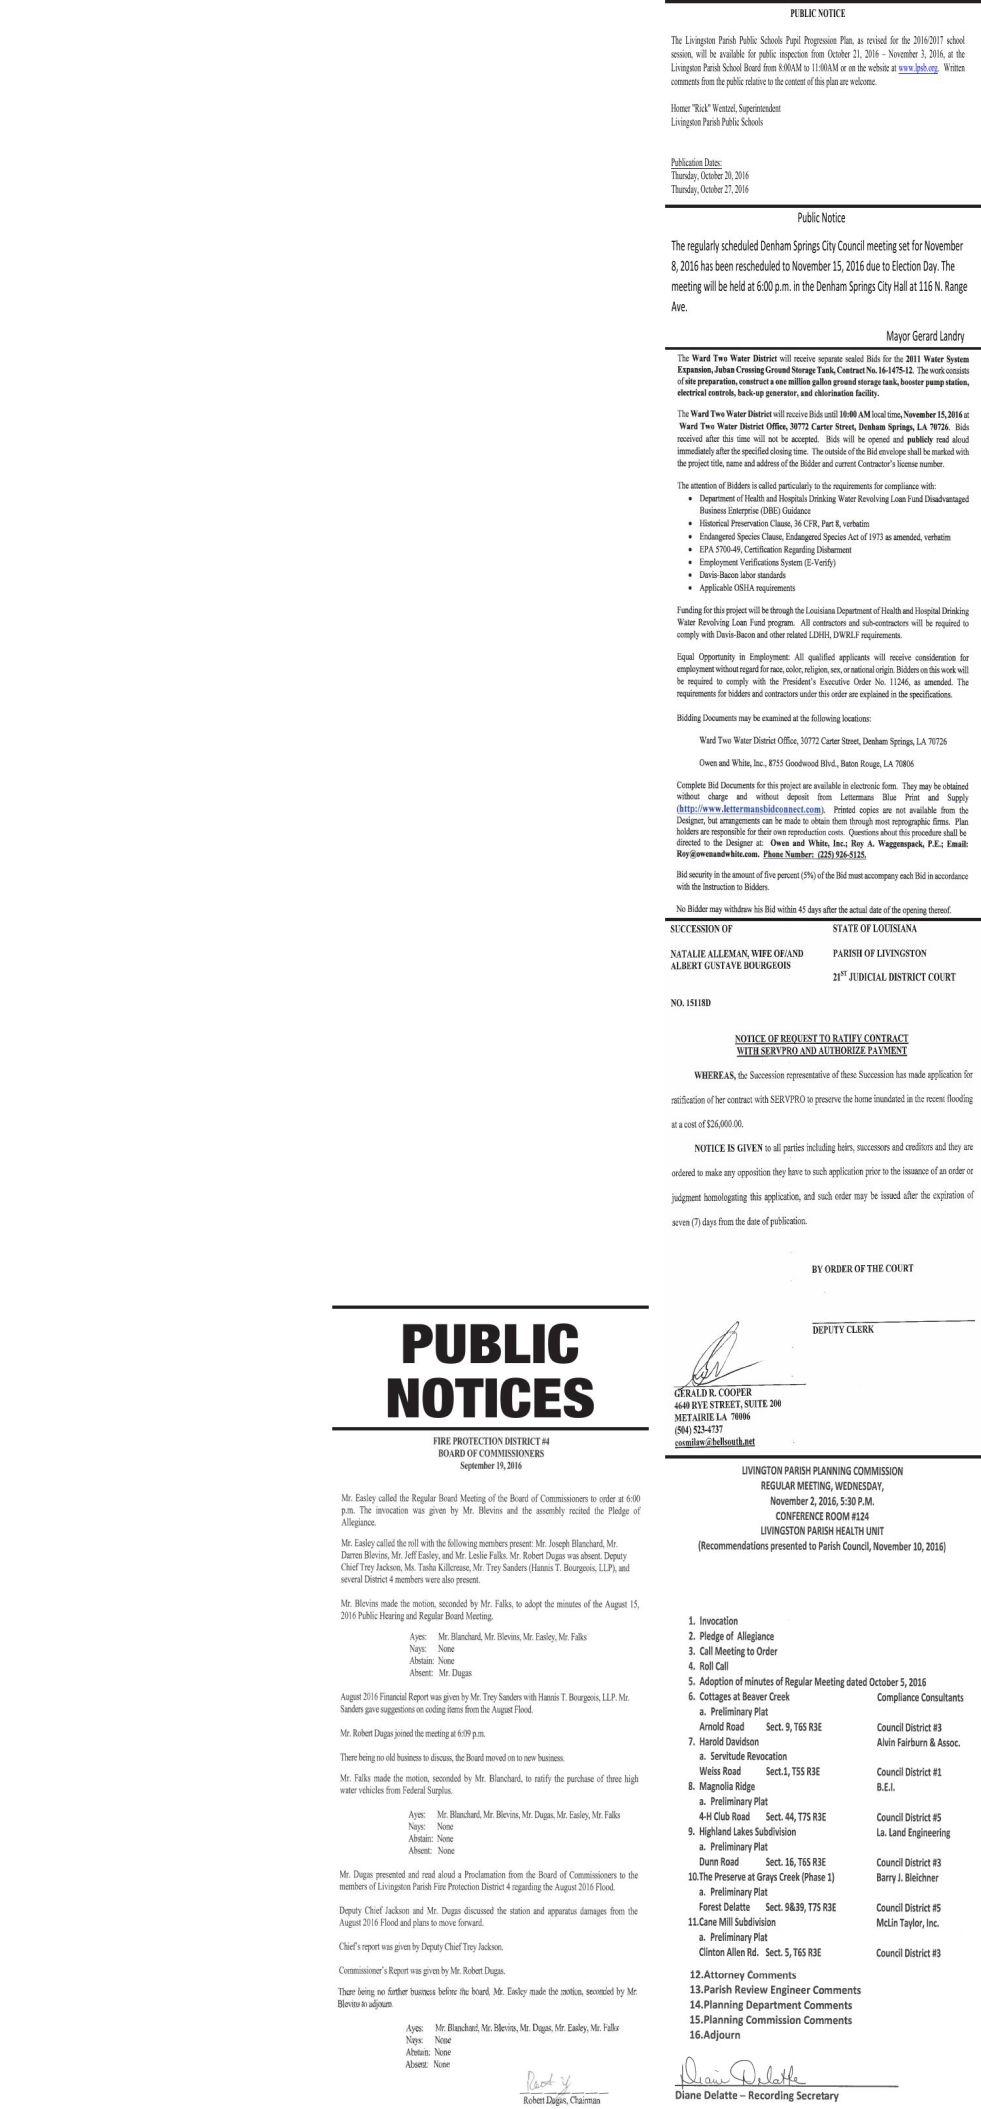 Public Notices published October 27, 2016